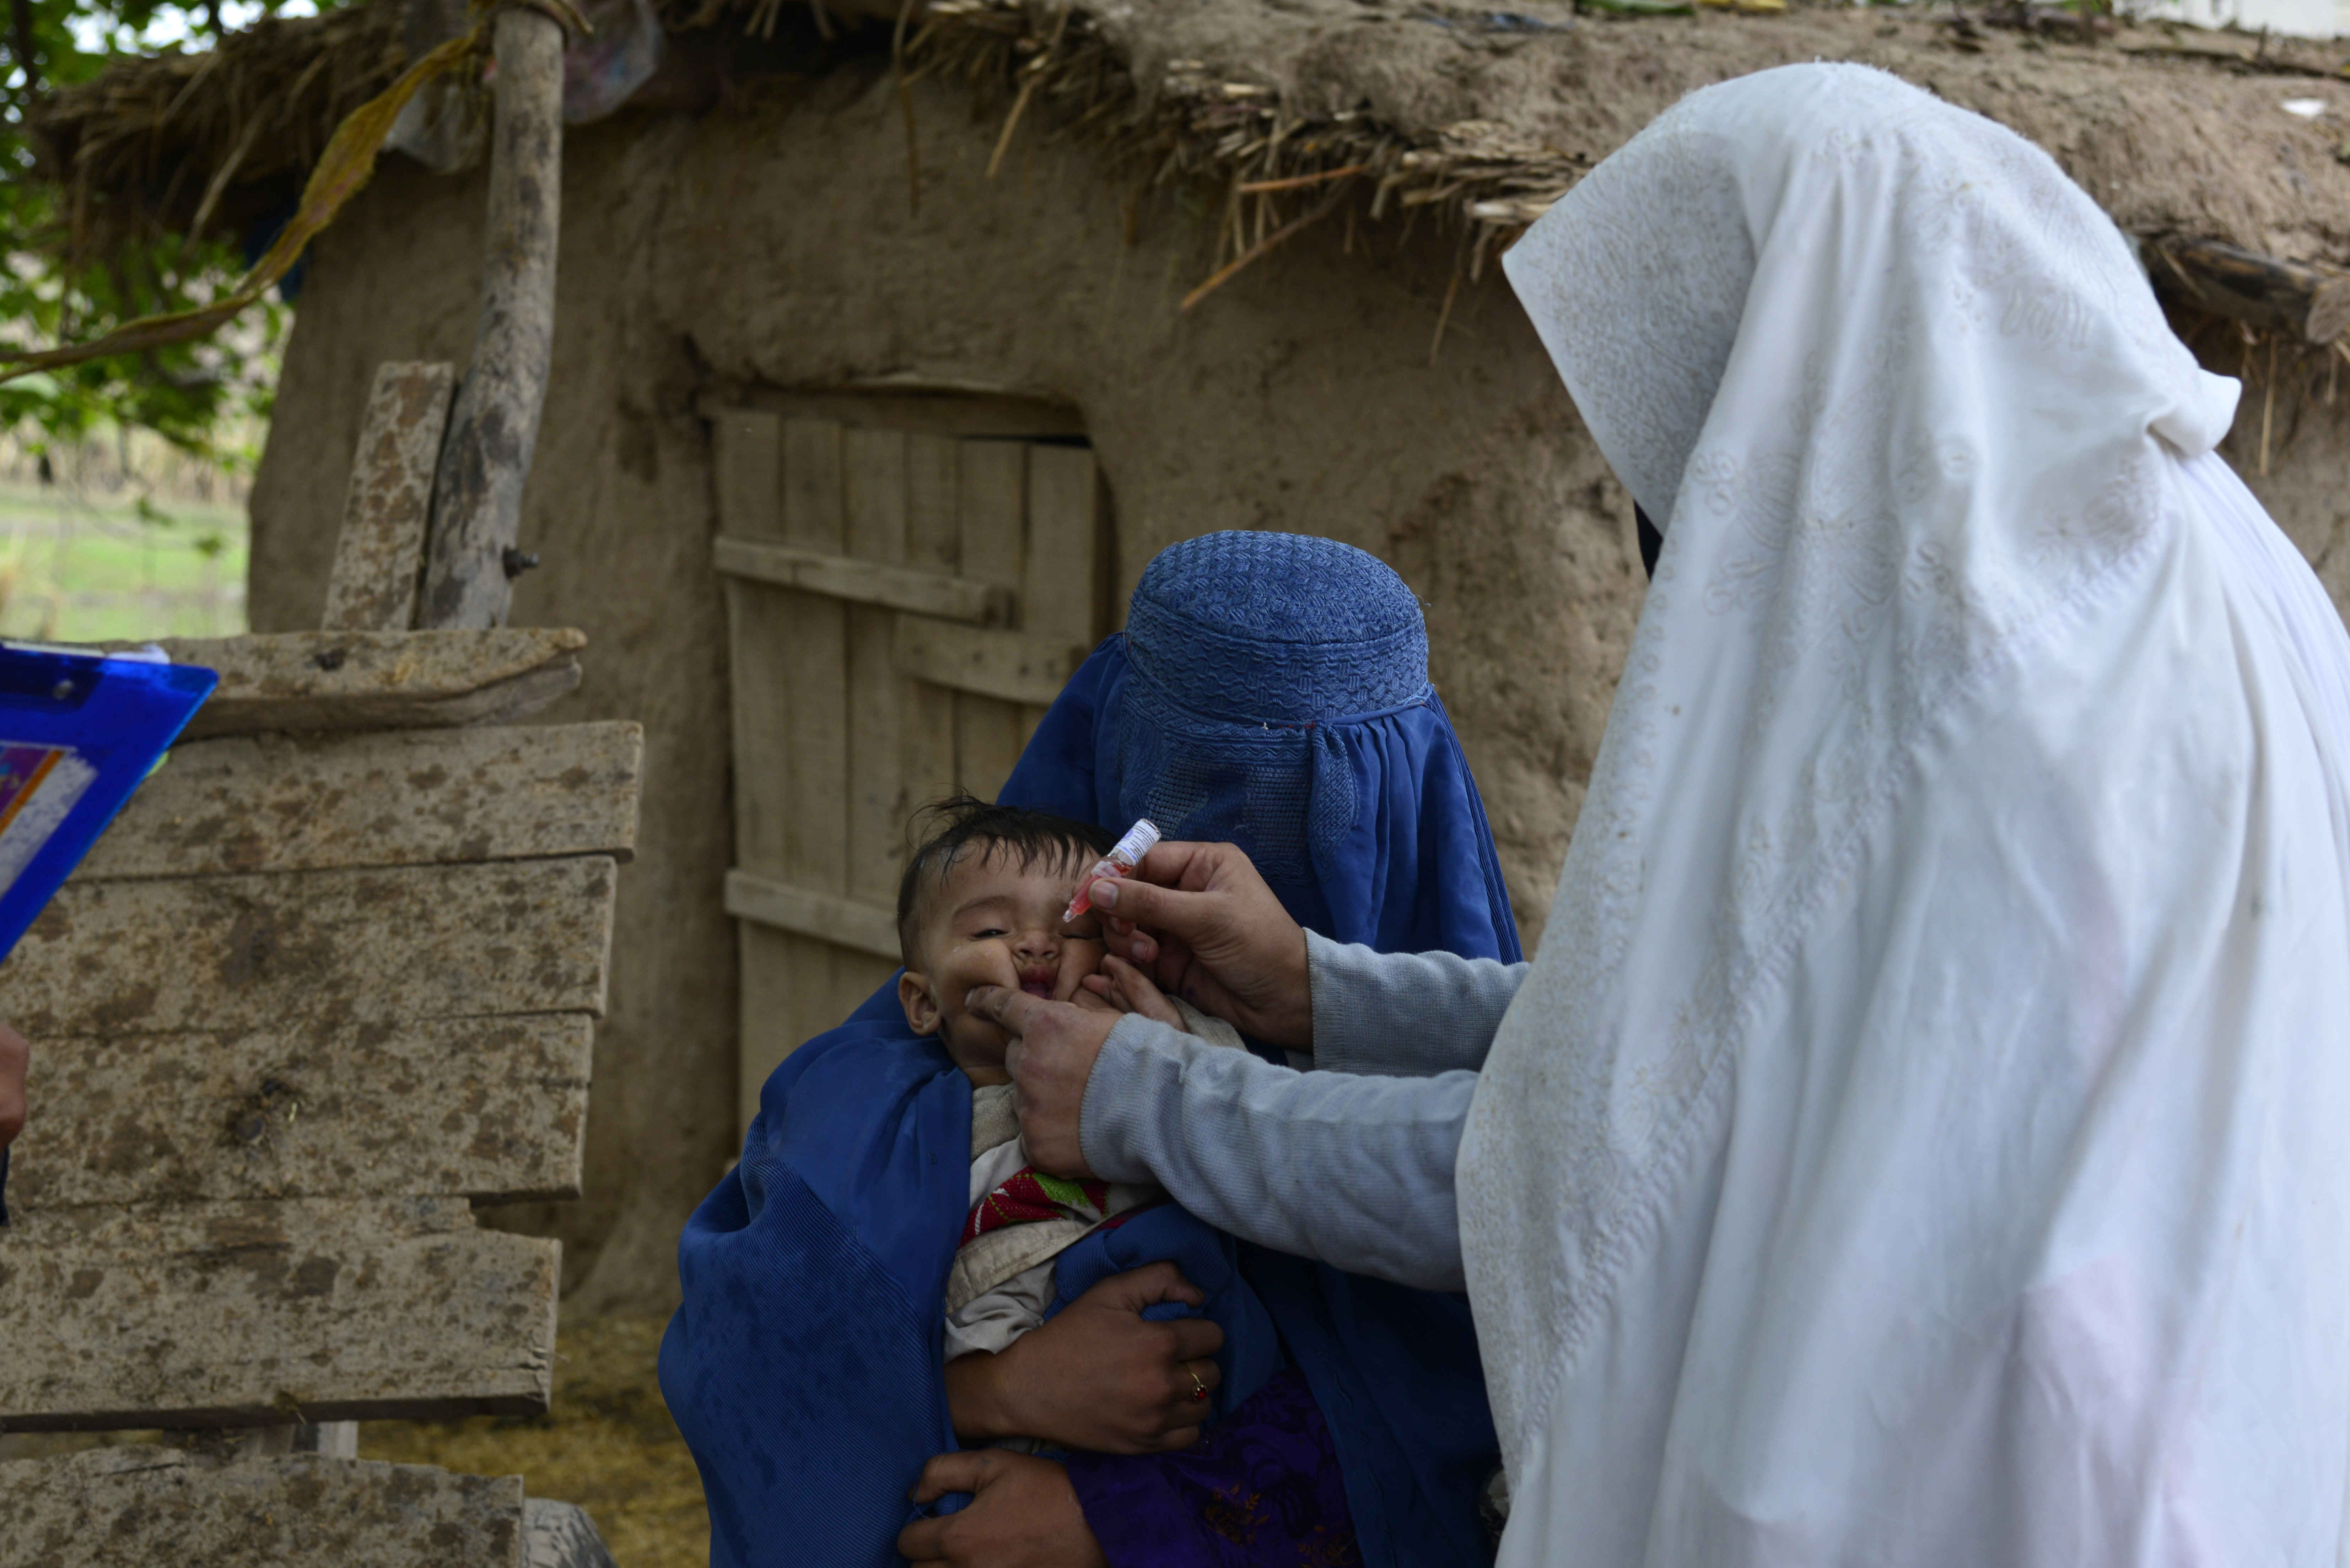 Pakistan seeks to block online anti-polio vaccine content